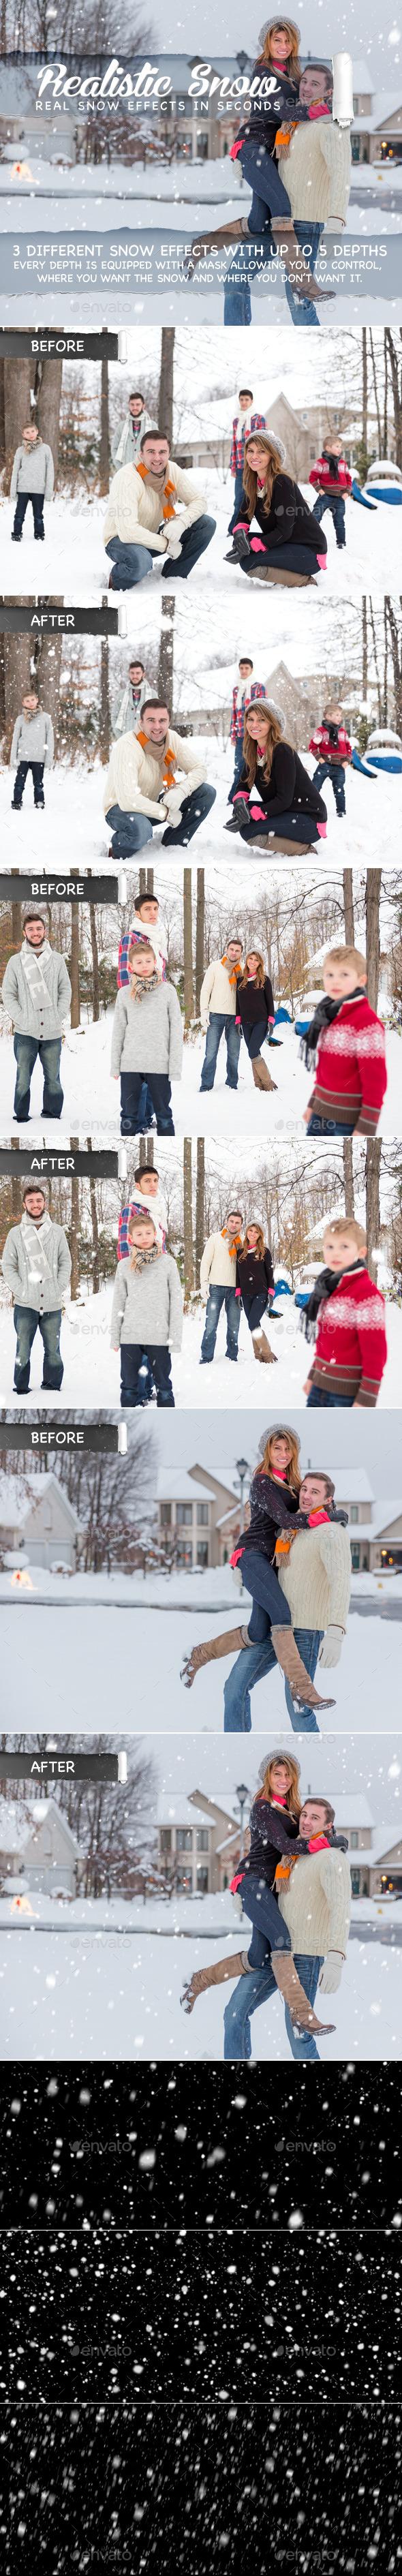 Realistic Snow - Decorative Graphics